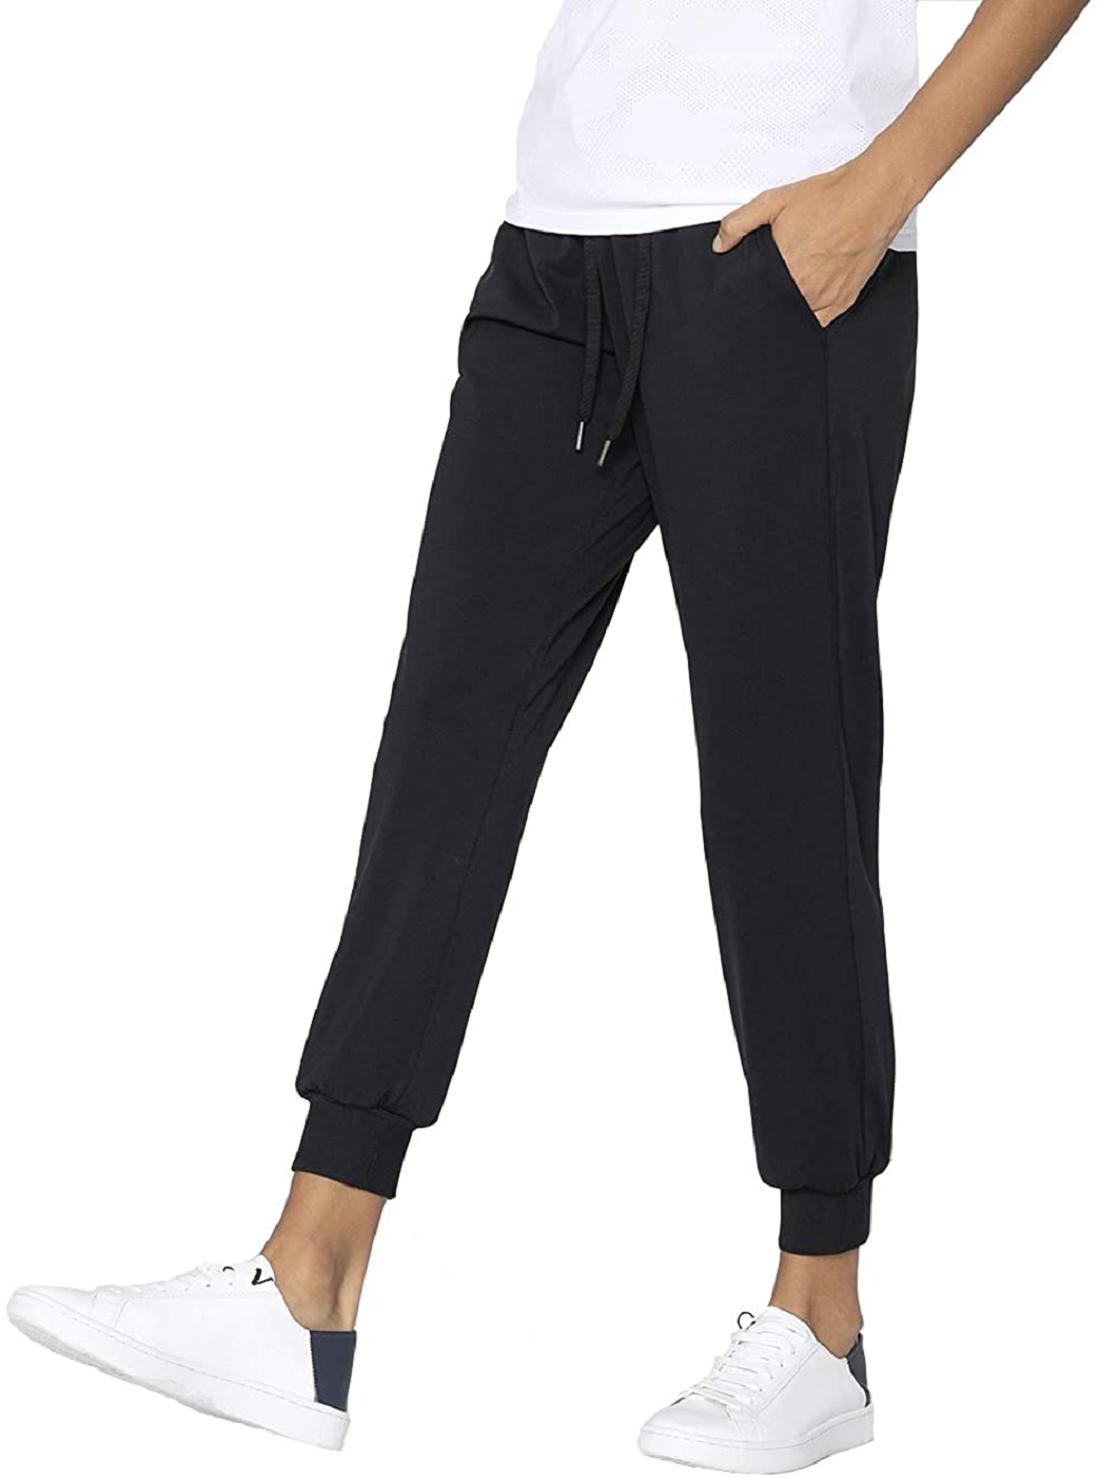 Wholesale Women's Draw String Jogger Pants